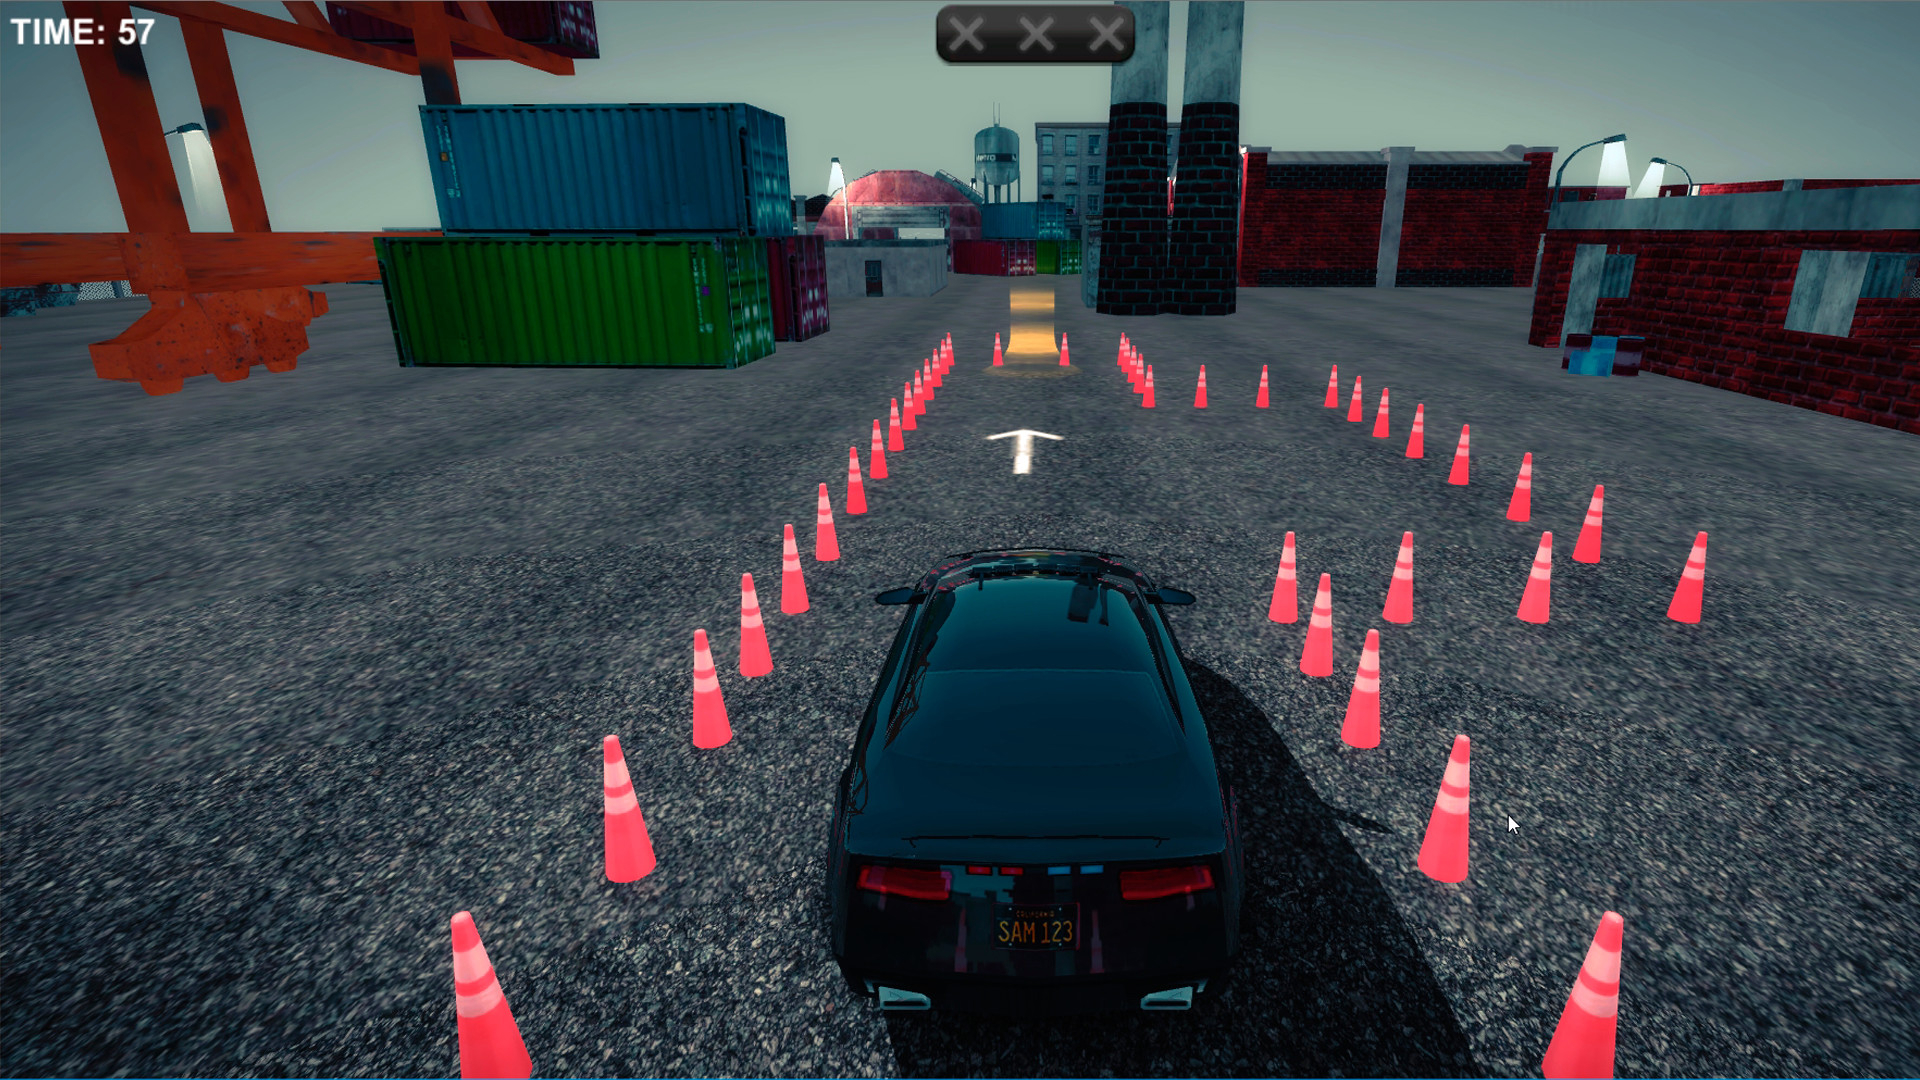 novos Jogos de estacionar para Android